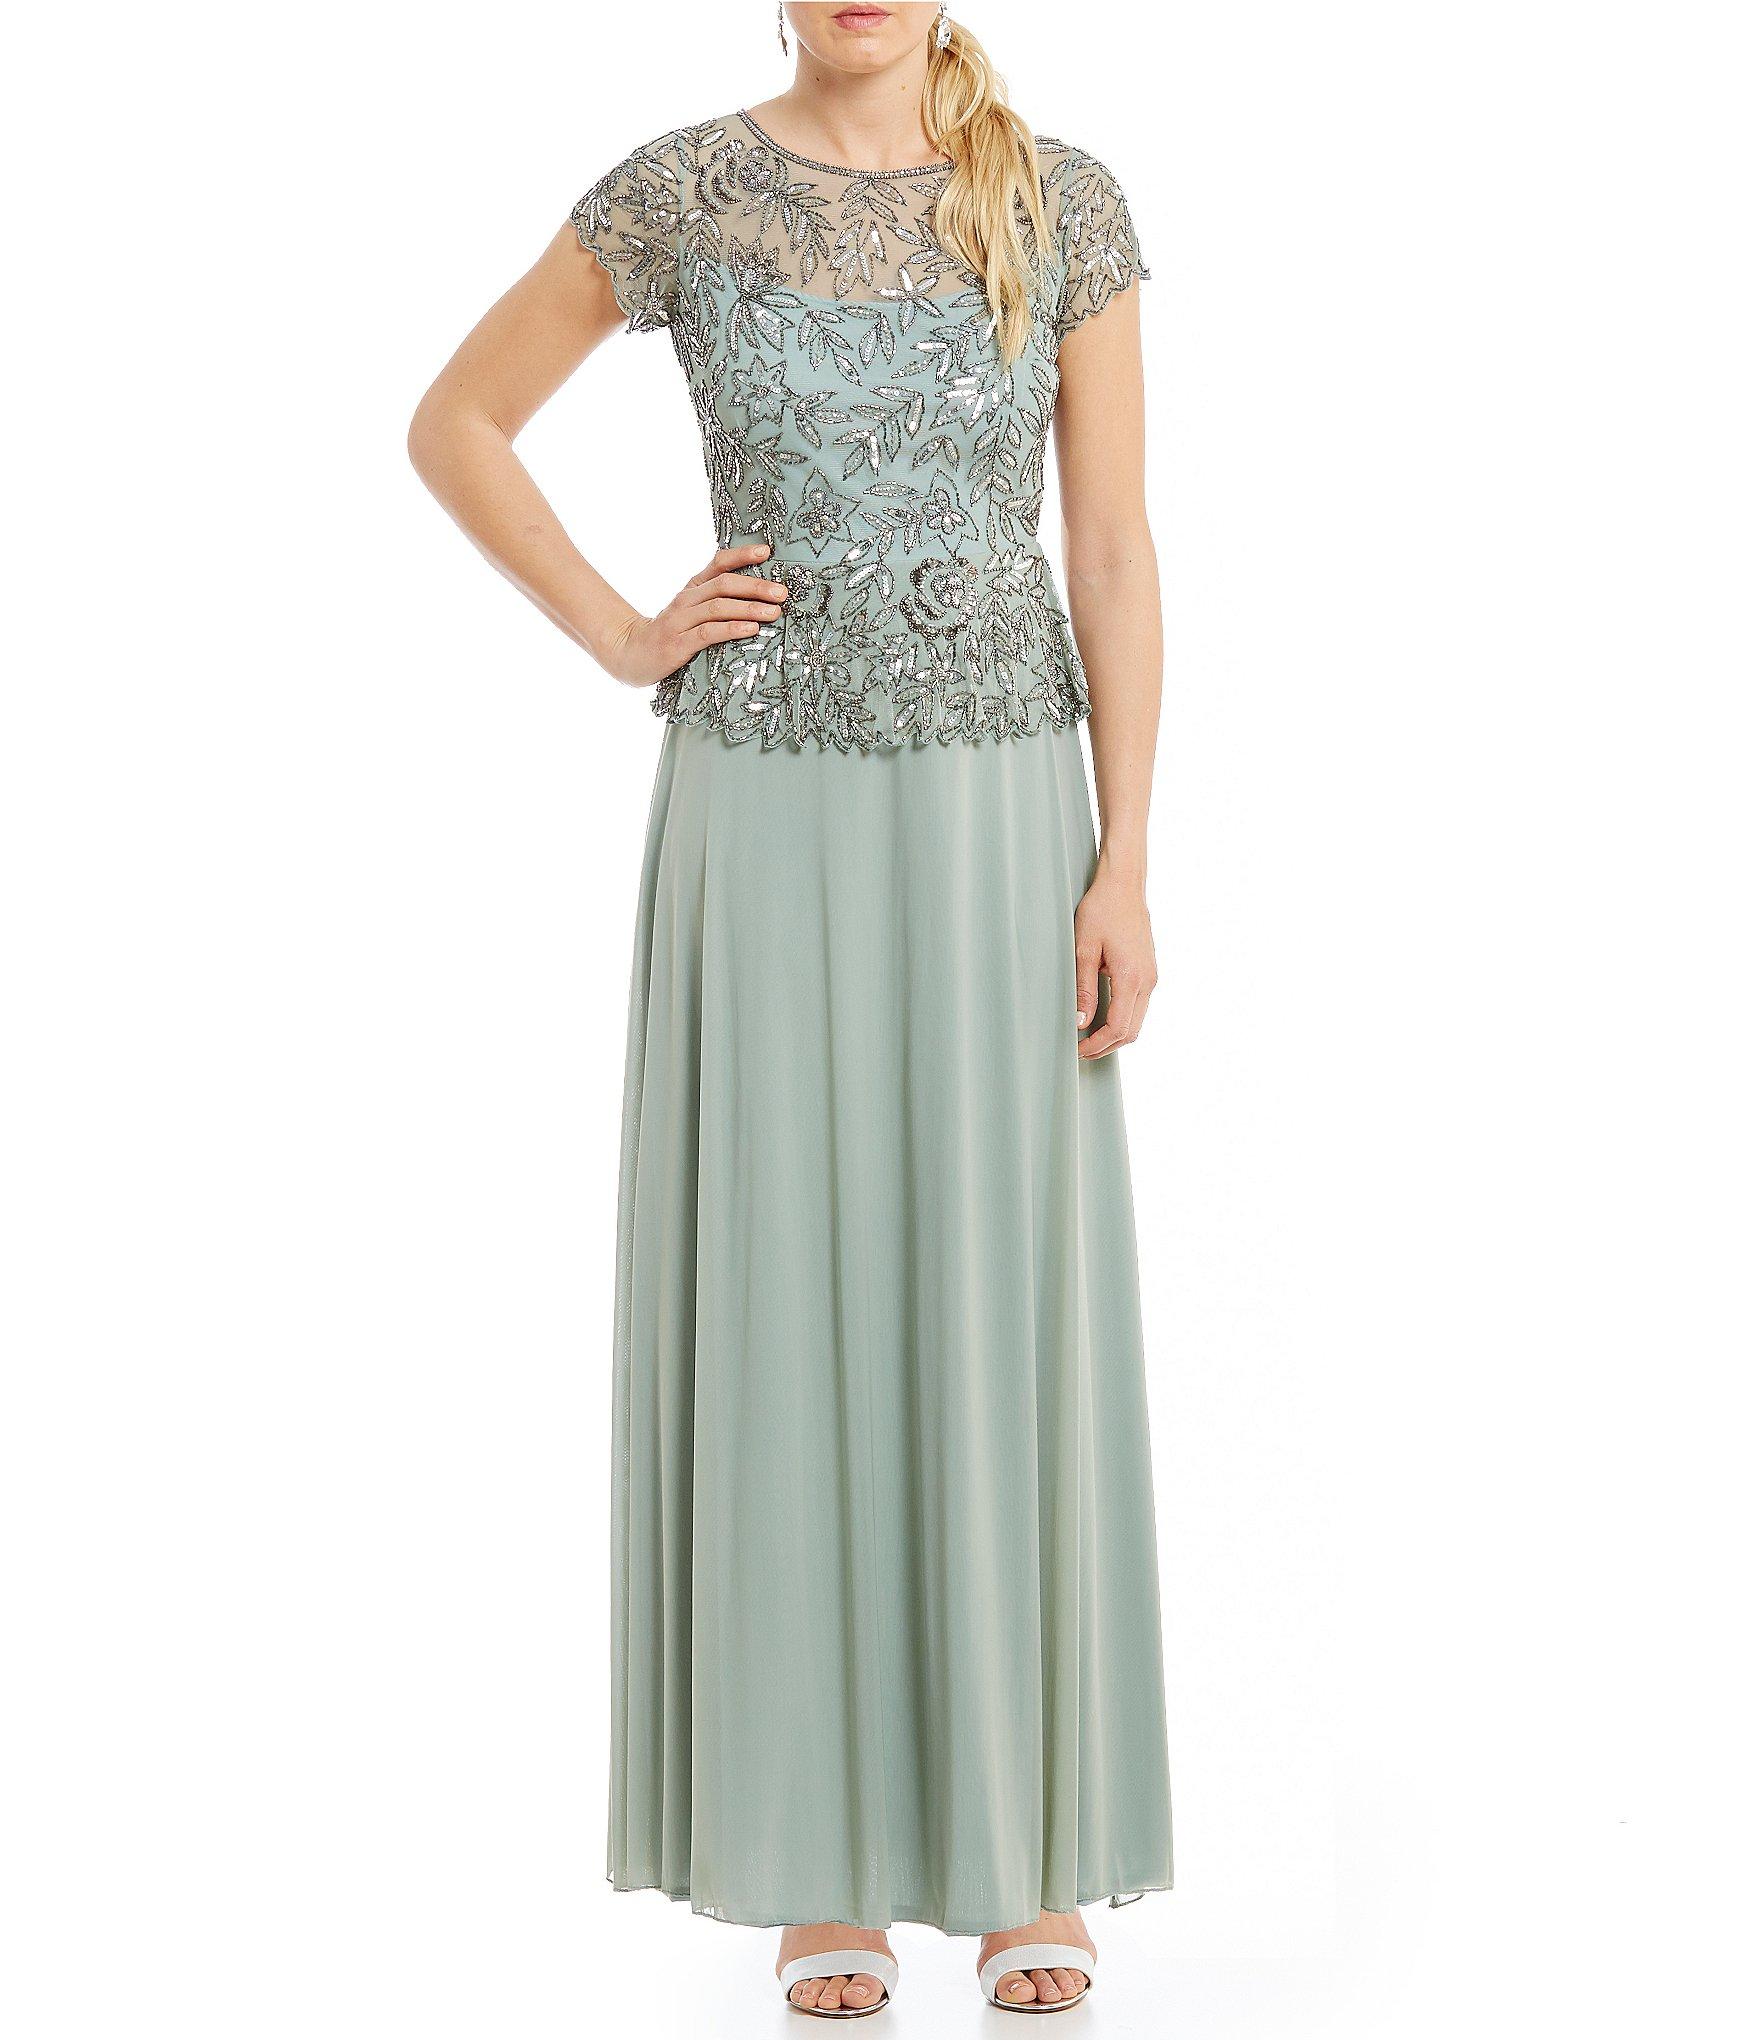 Women\'s Formal Dresses & Gowns | Dillards